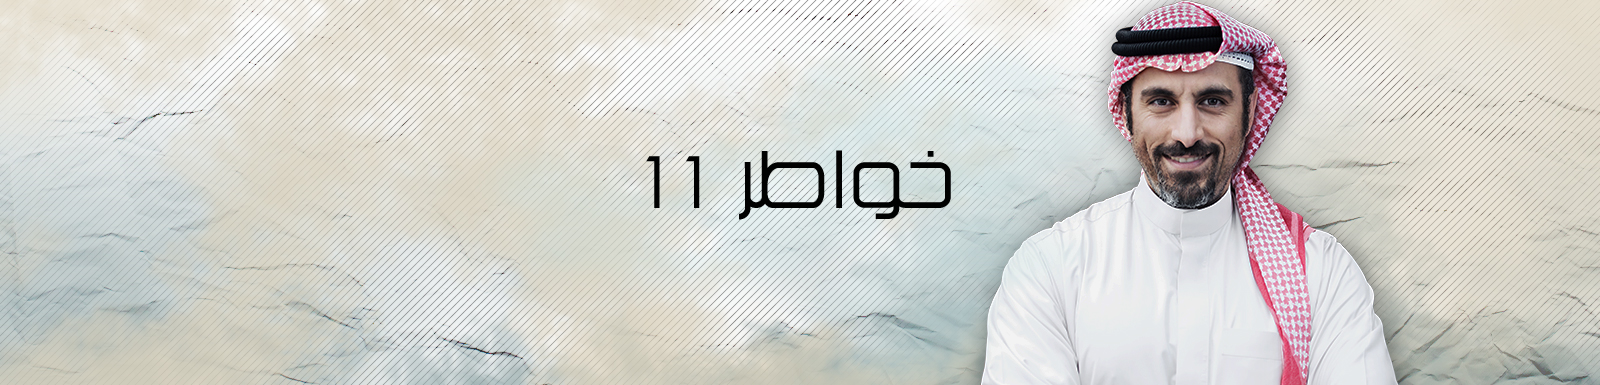 ����� ������ ����� 11 ������ 9 ������ ������� ������